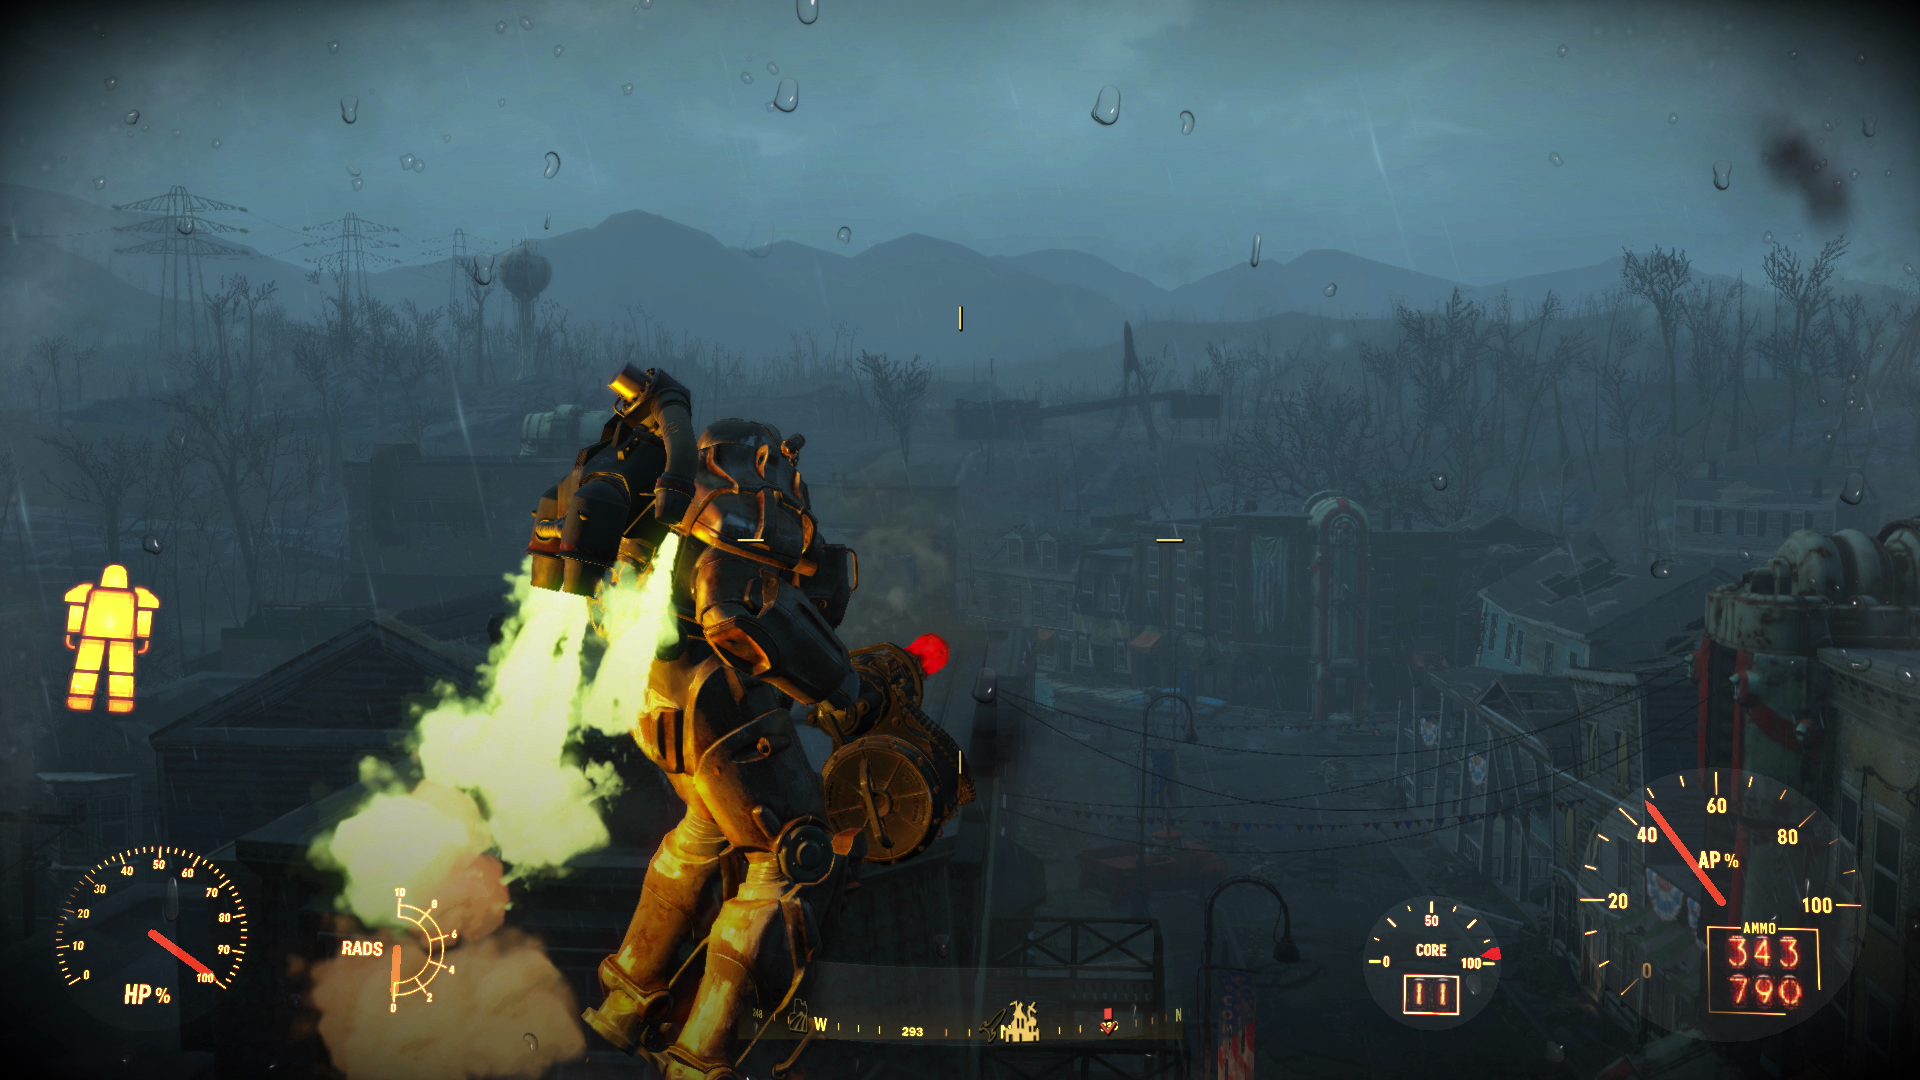 Fallout4 E3 Jetpack Fallout 4 Fallout